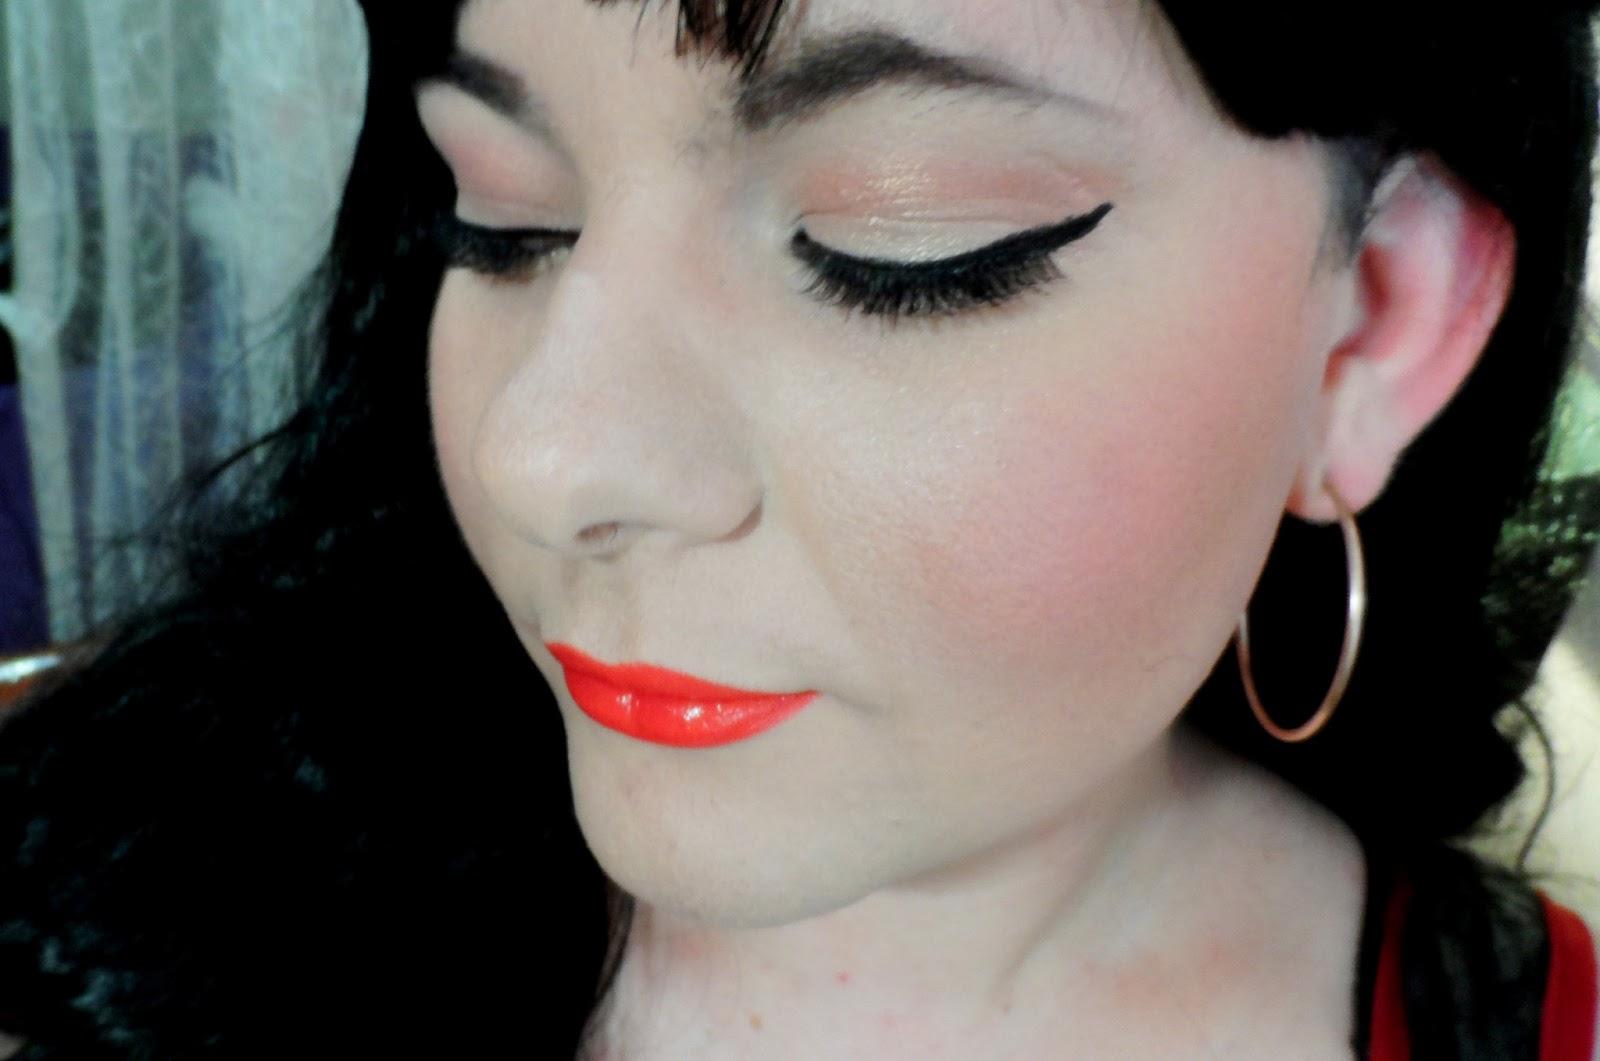 Tutorial lady zorro inspired makeup look halloween 2013 baditri Images